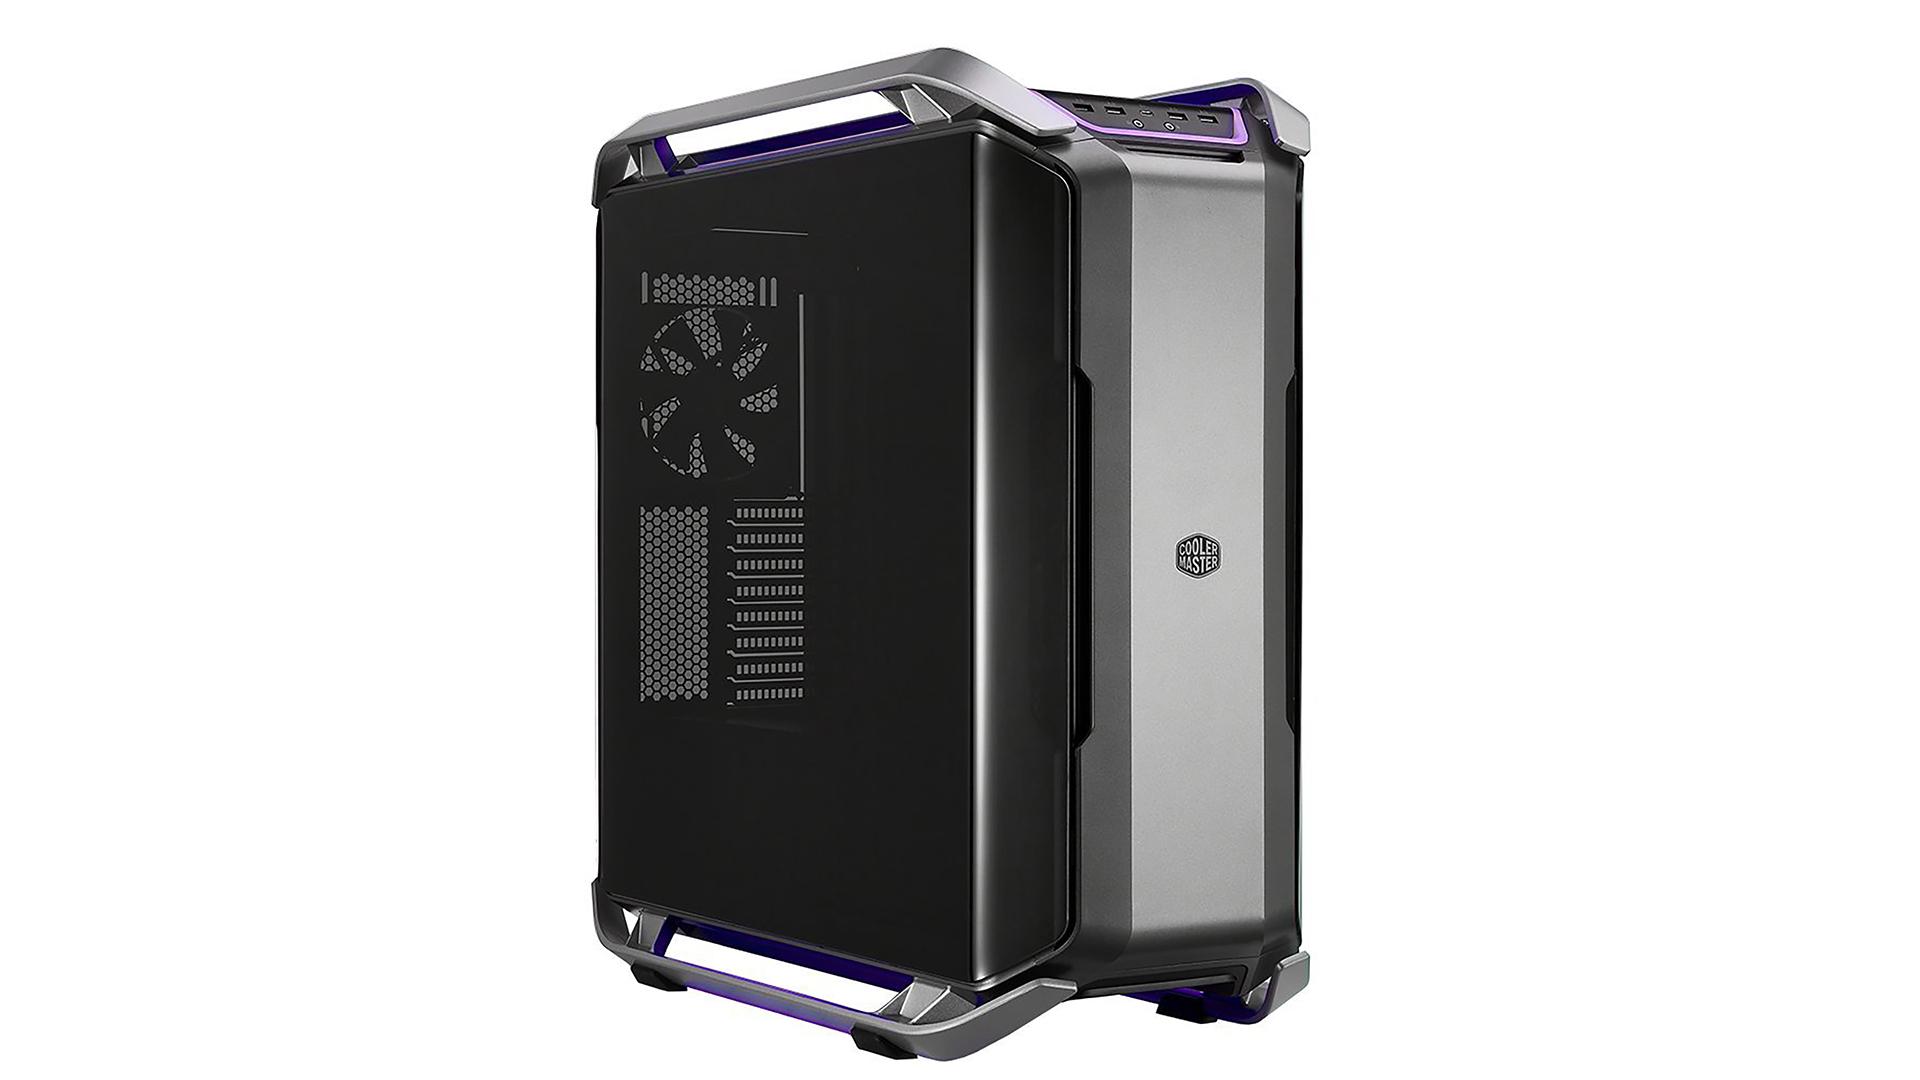 Best PC case 2018: top cases for your desktop computer